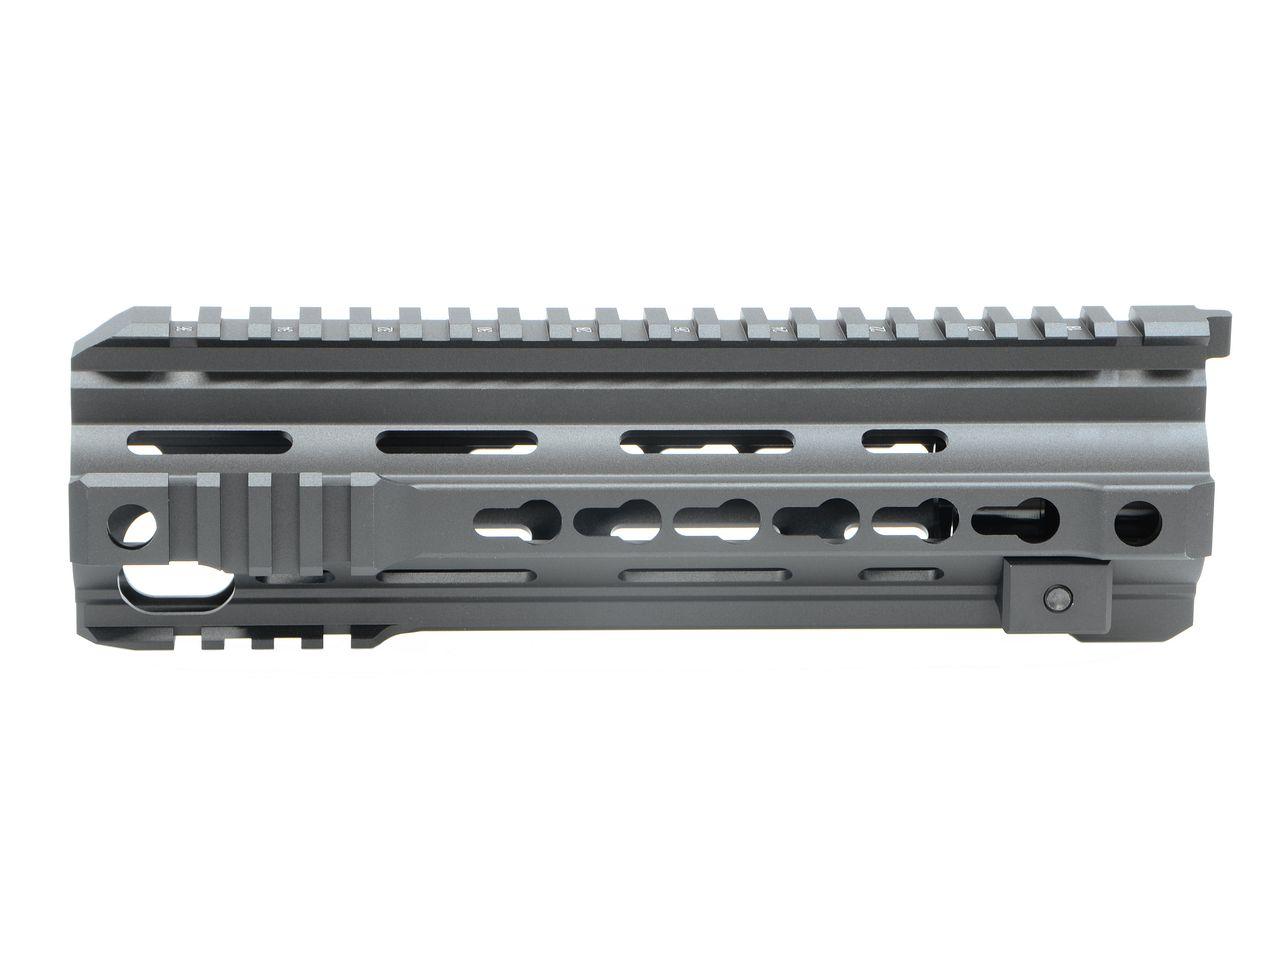 VFC HK416 9in レイルシステム(Keymod)